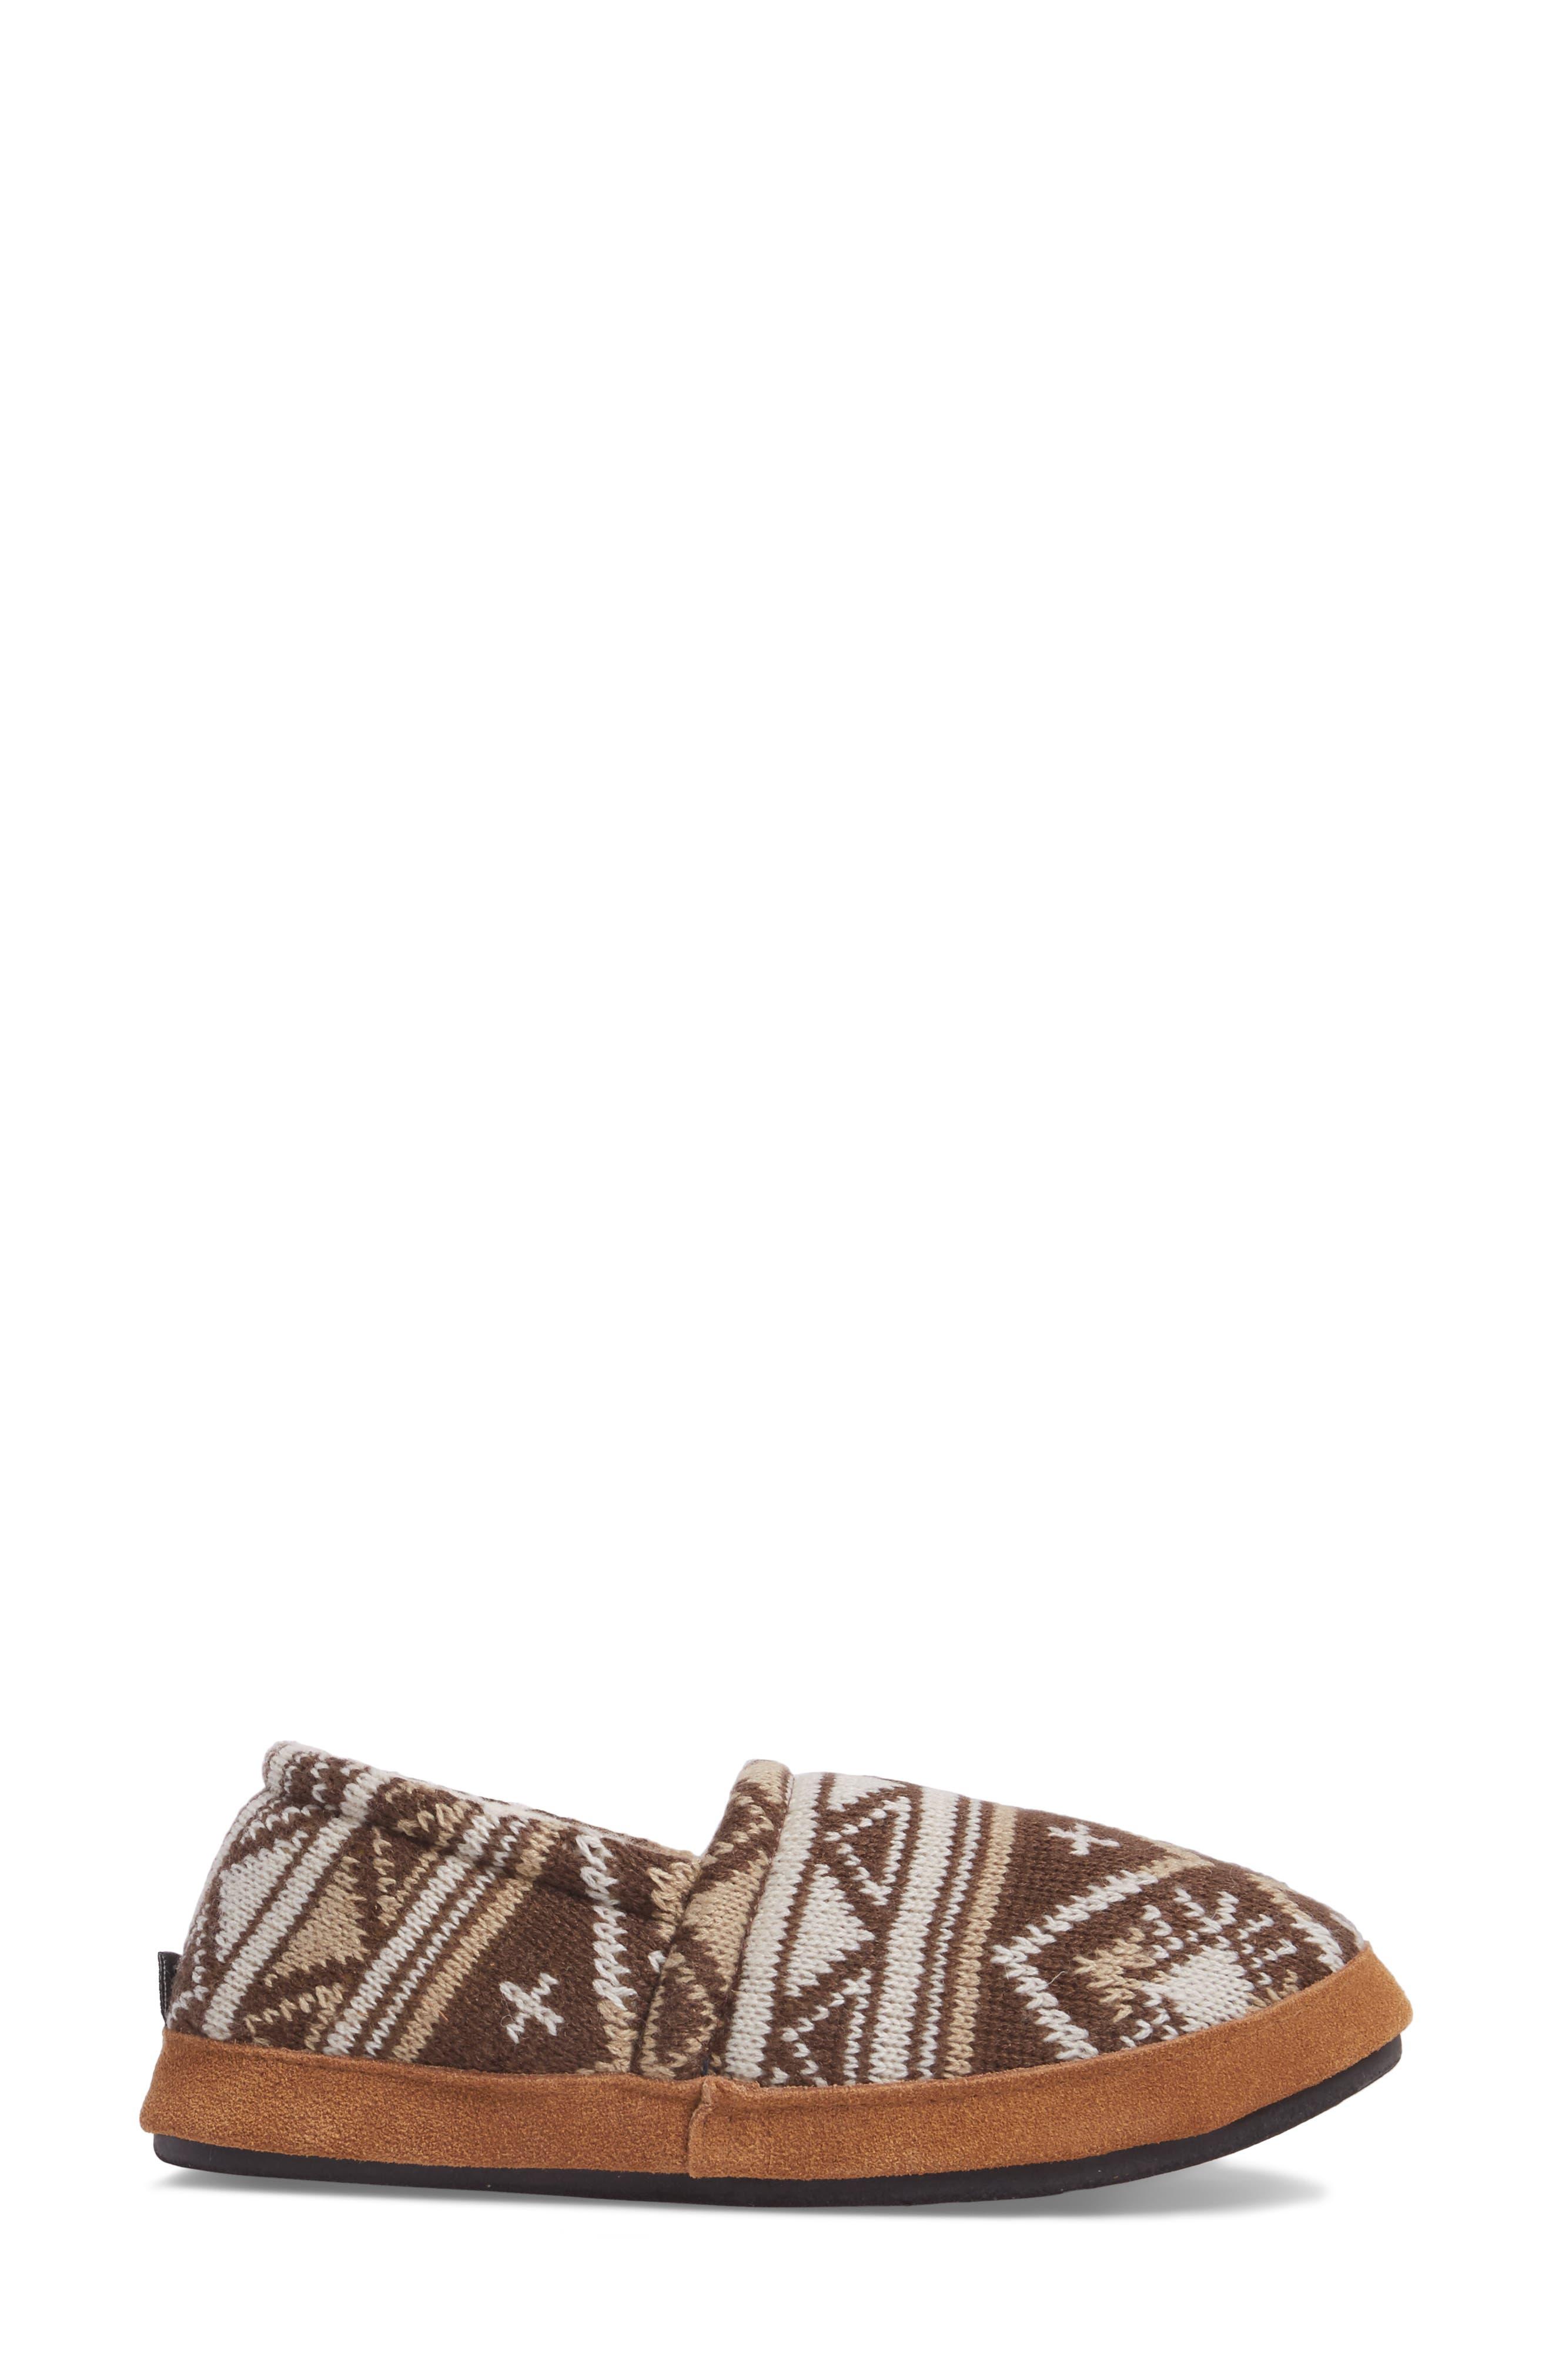 Alternate Image 3  - Woolrich Whitecap Knit Slipper (Women)